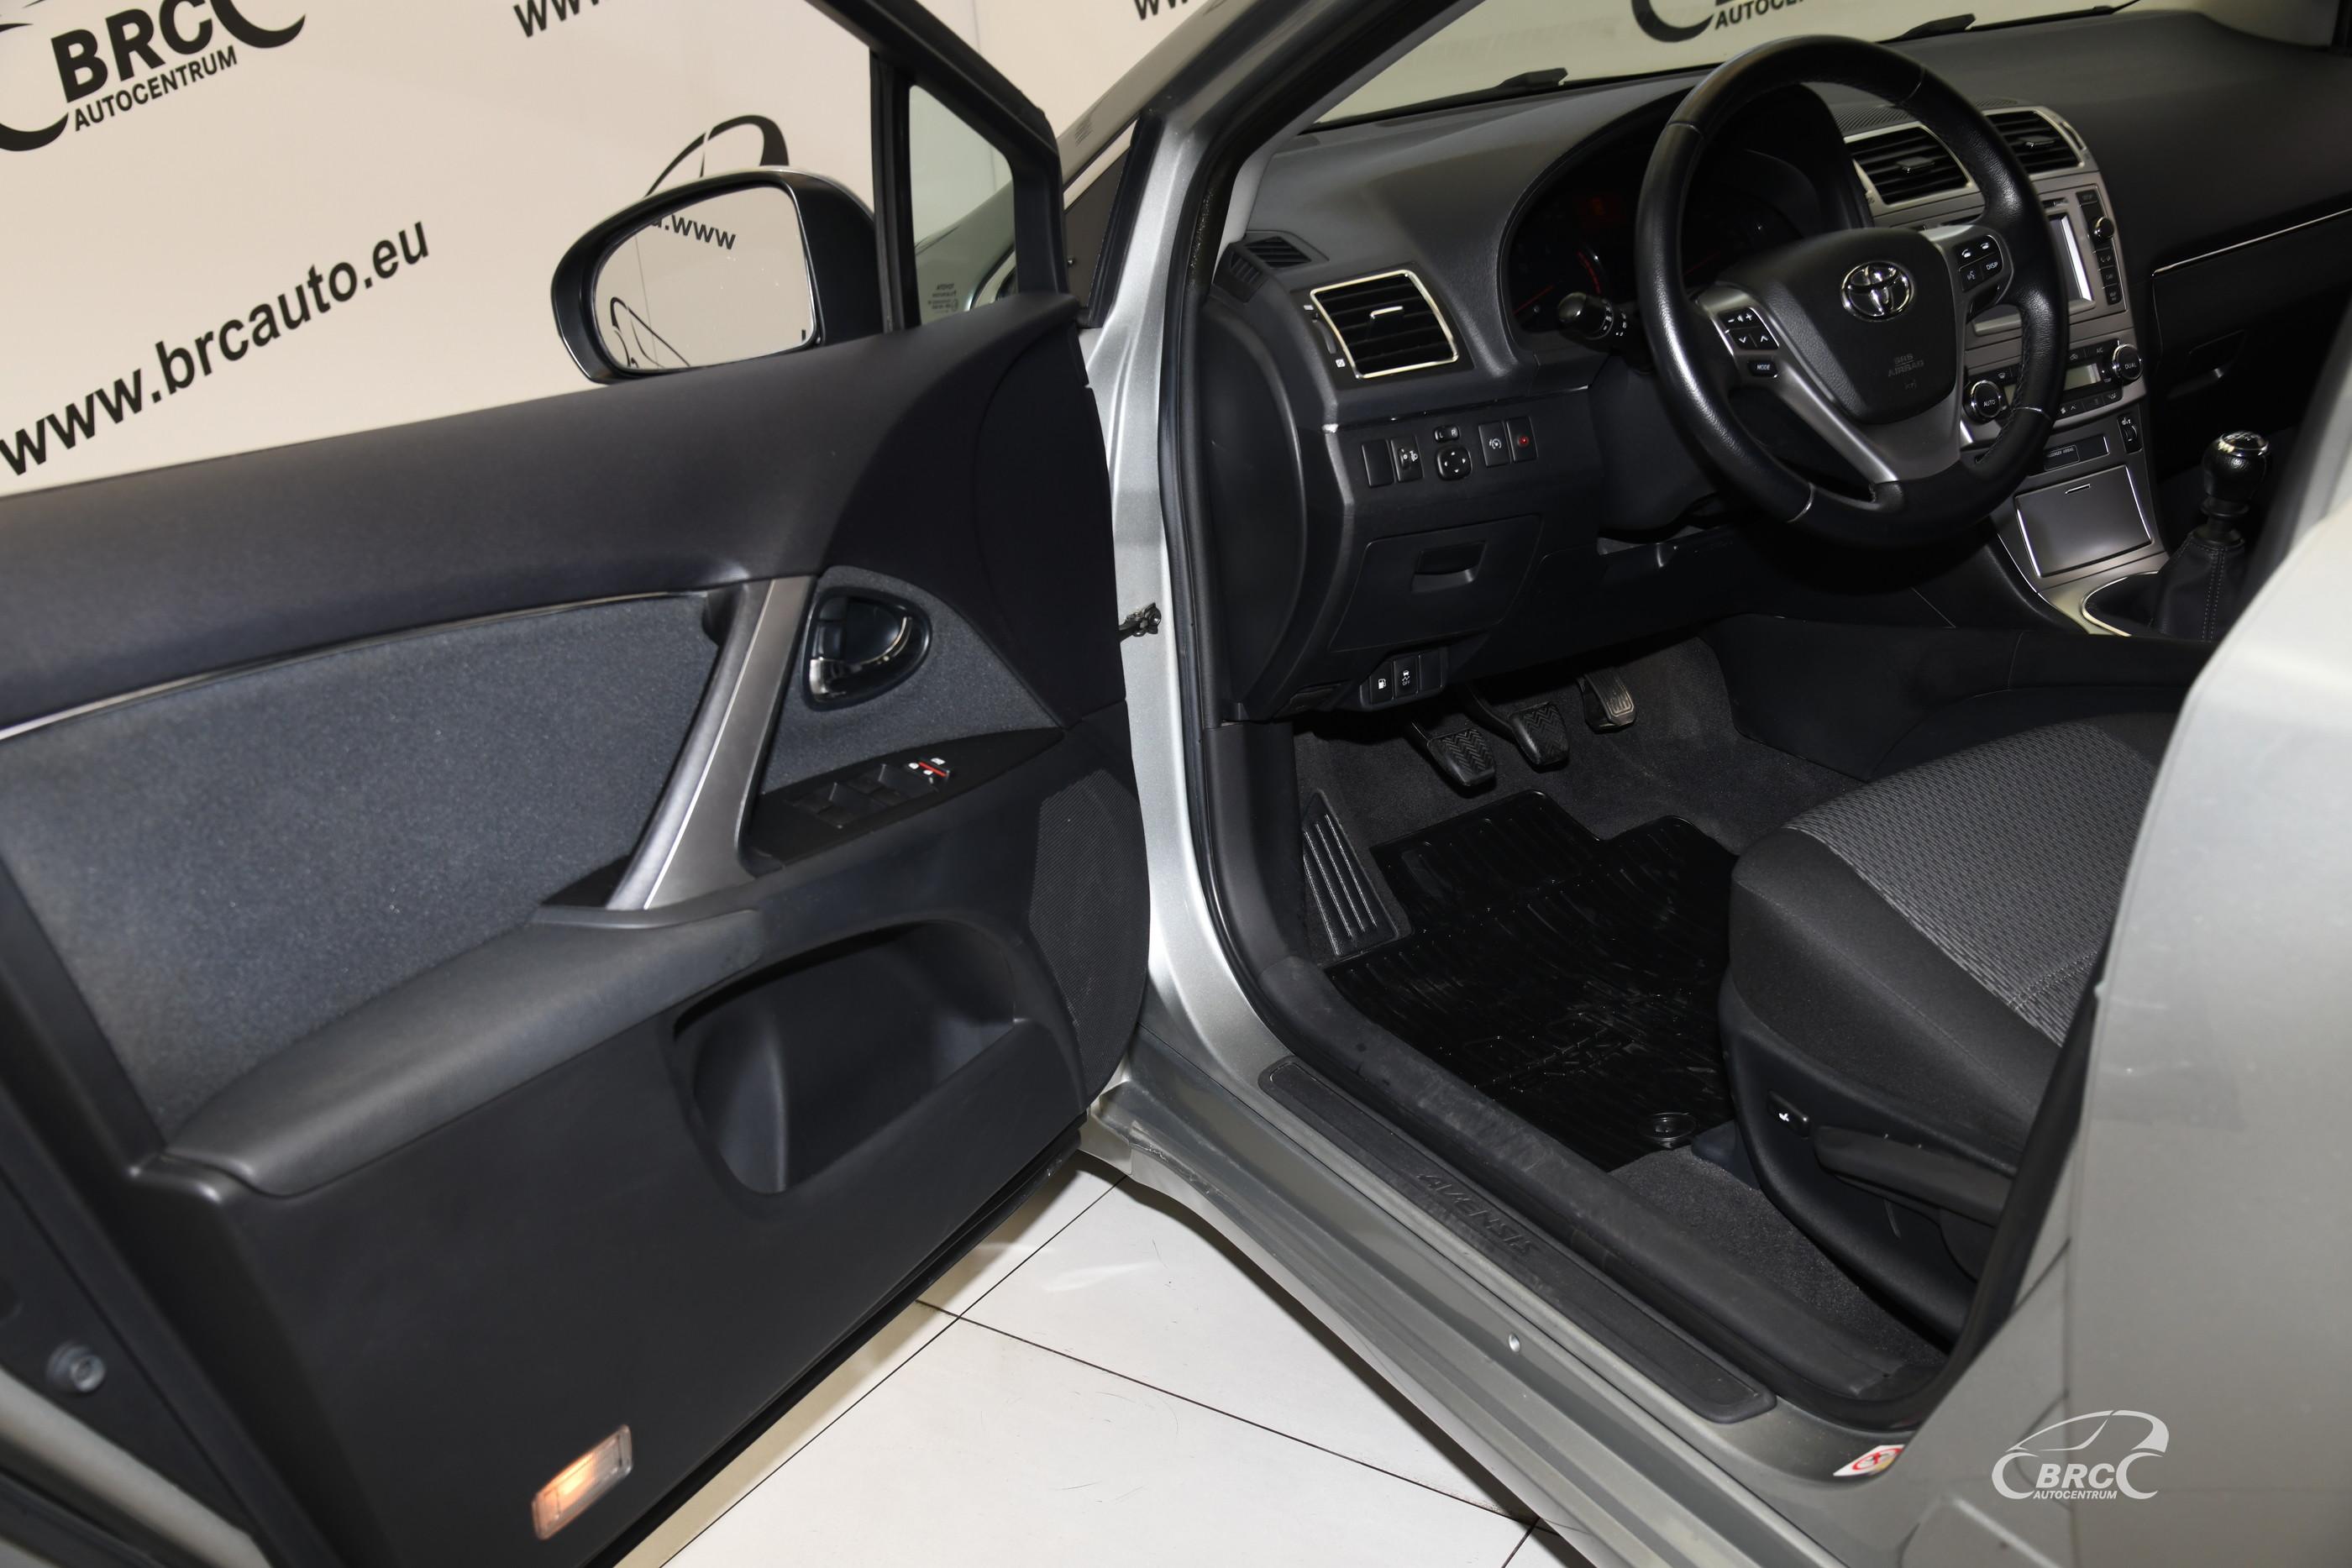 Toyota Avensis 2.0 D-4D Wagon Linea Sol